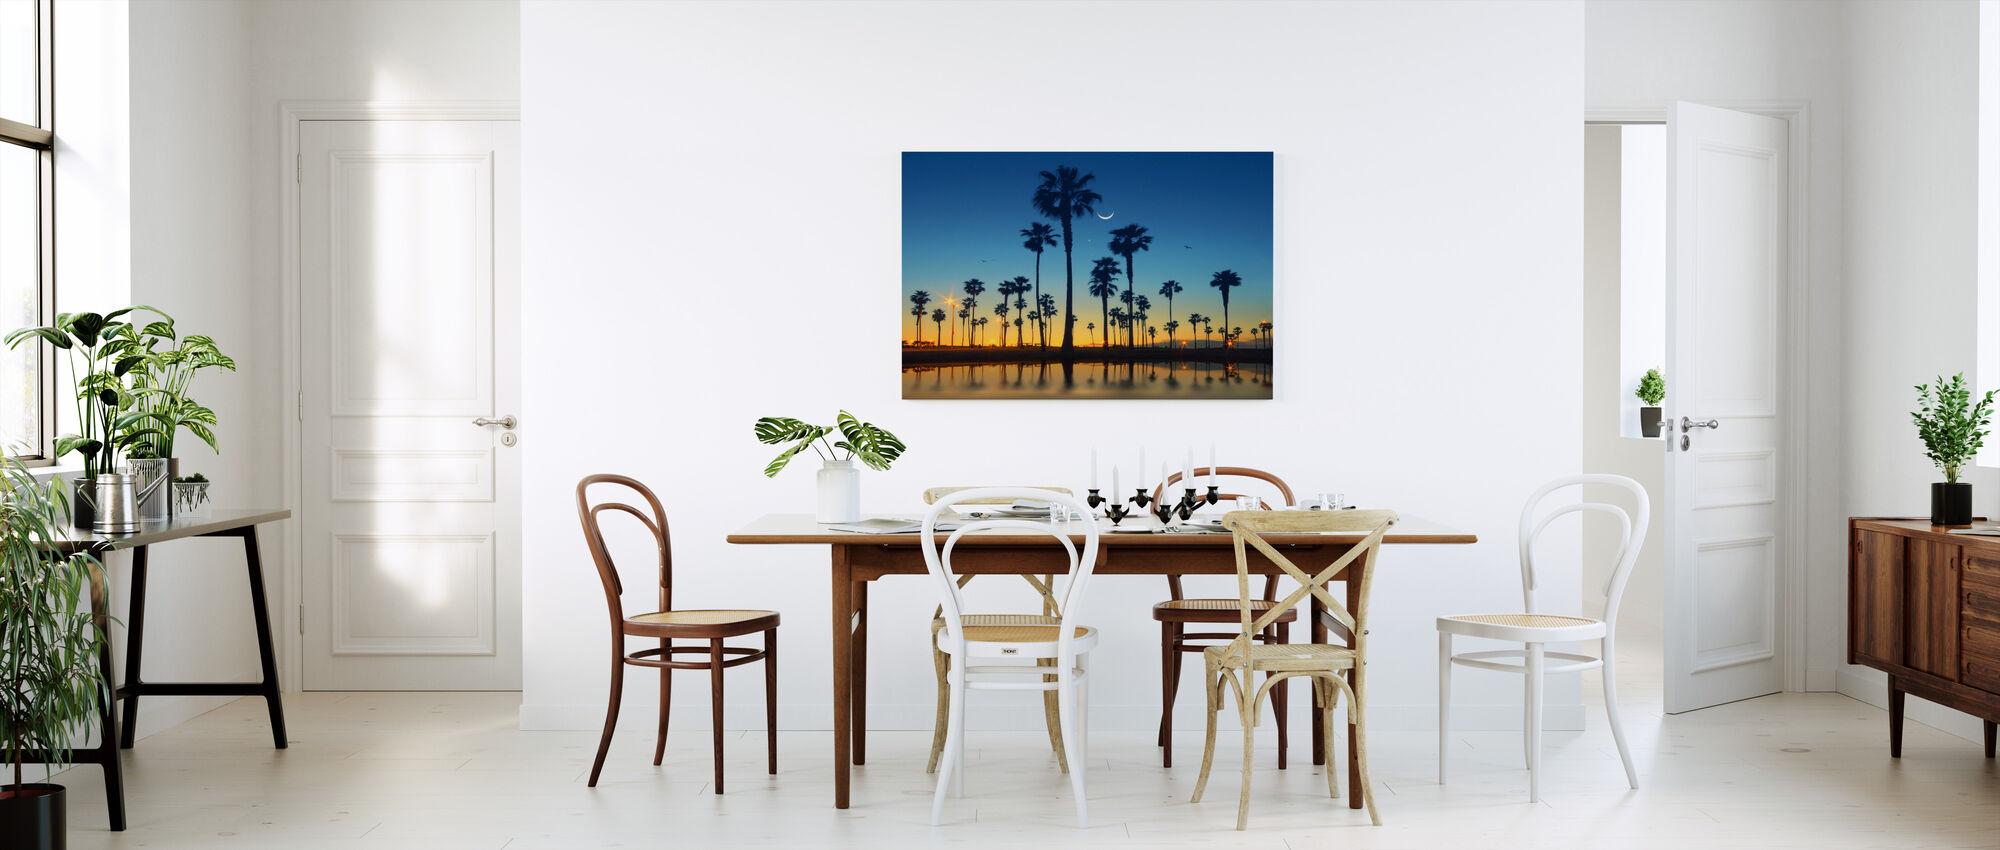 Palmujen rivi - Canvastaulu - Keittiö